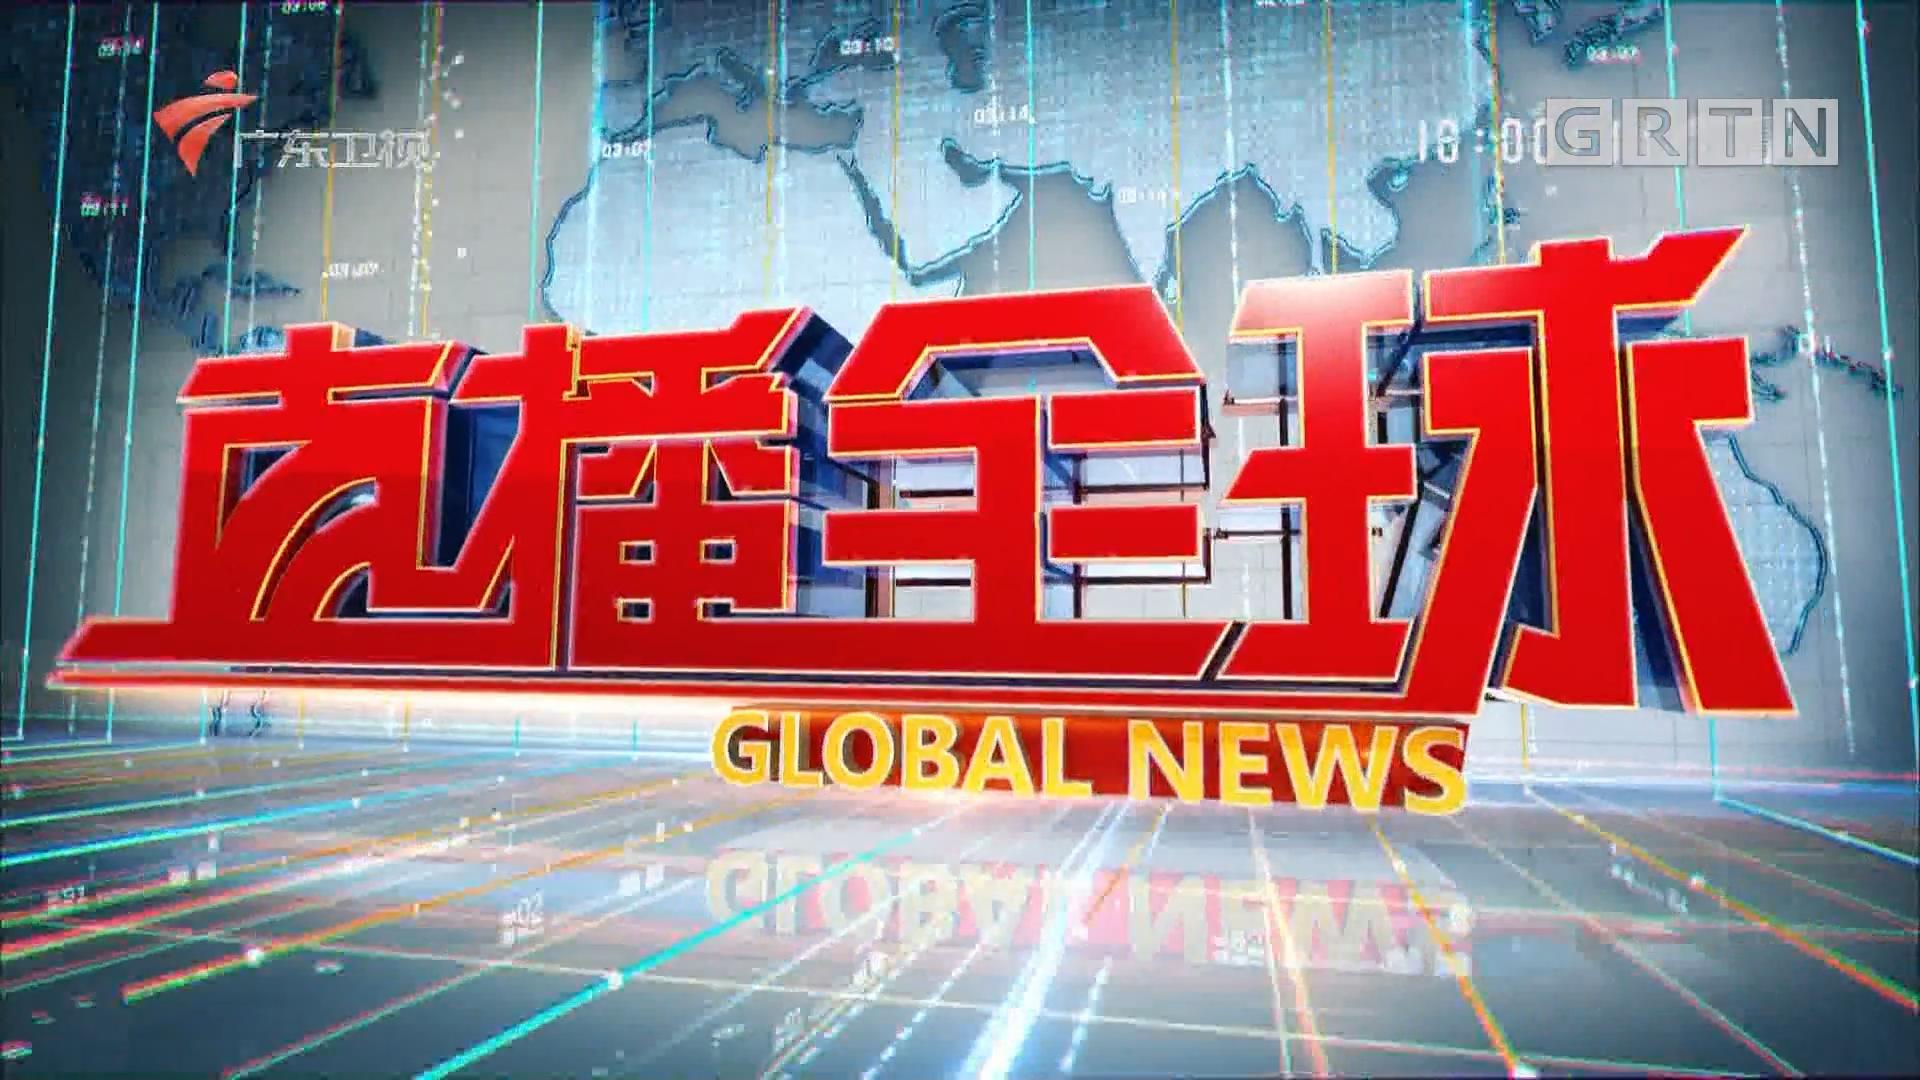 [HD][2019-06-10]直播全球:圣彼得堡国际经济论坛闭幕:中俄合作迈上新台阶 广东企业积极作为